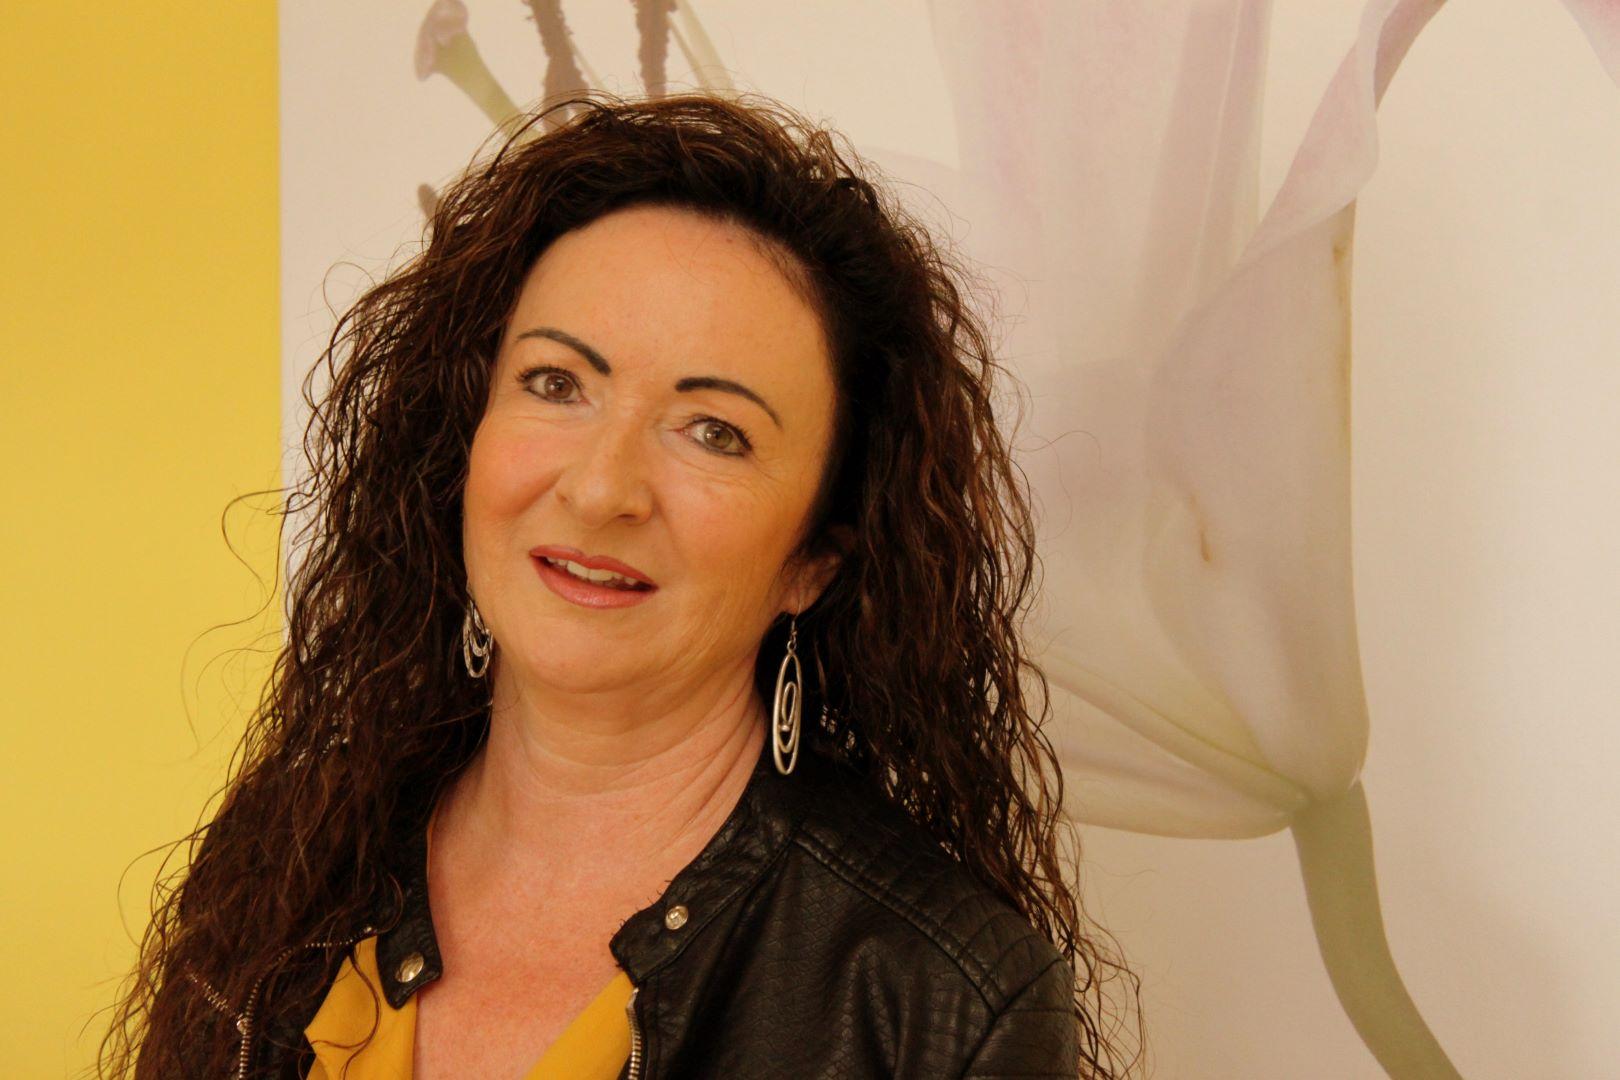 Katrin Widmer